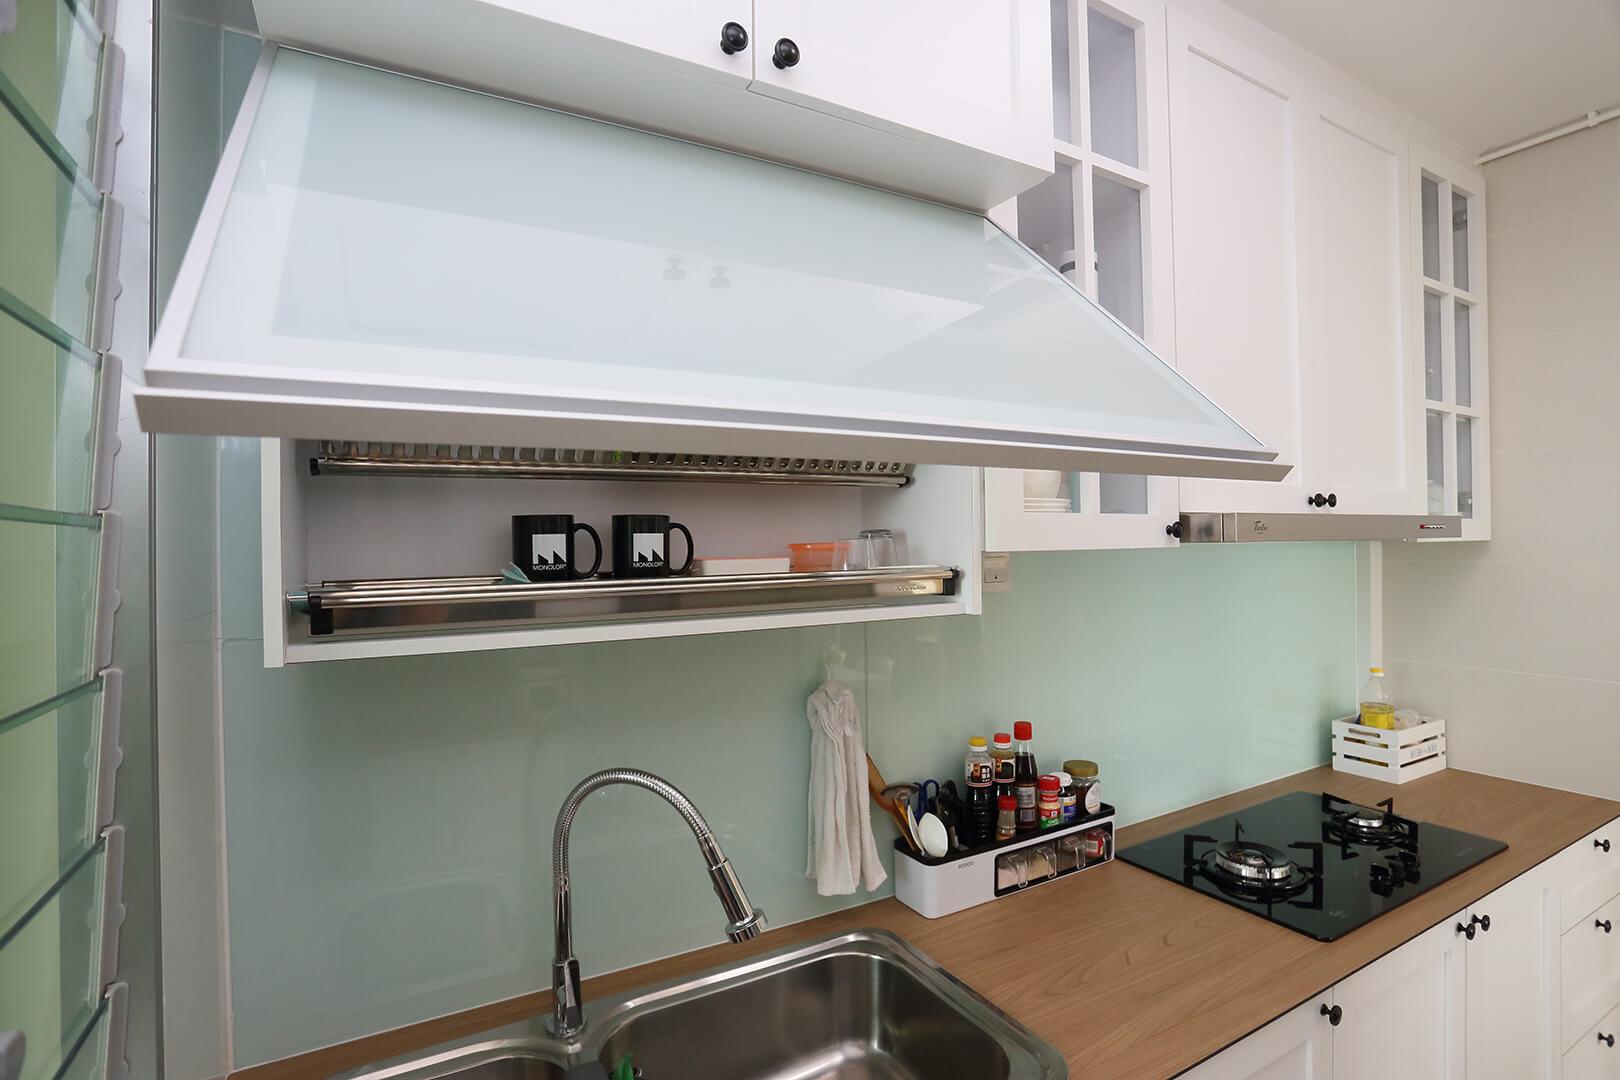 Scandinavian Interior Design Singapore Kitchen Top and Wares